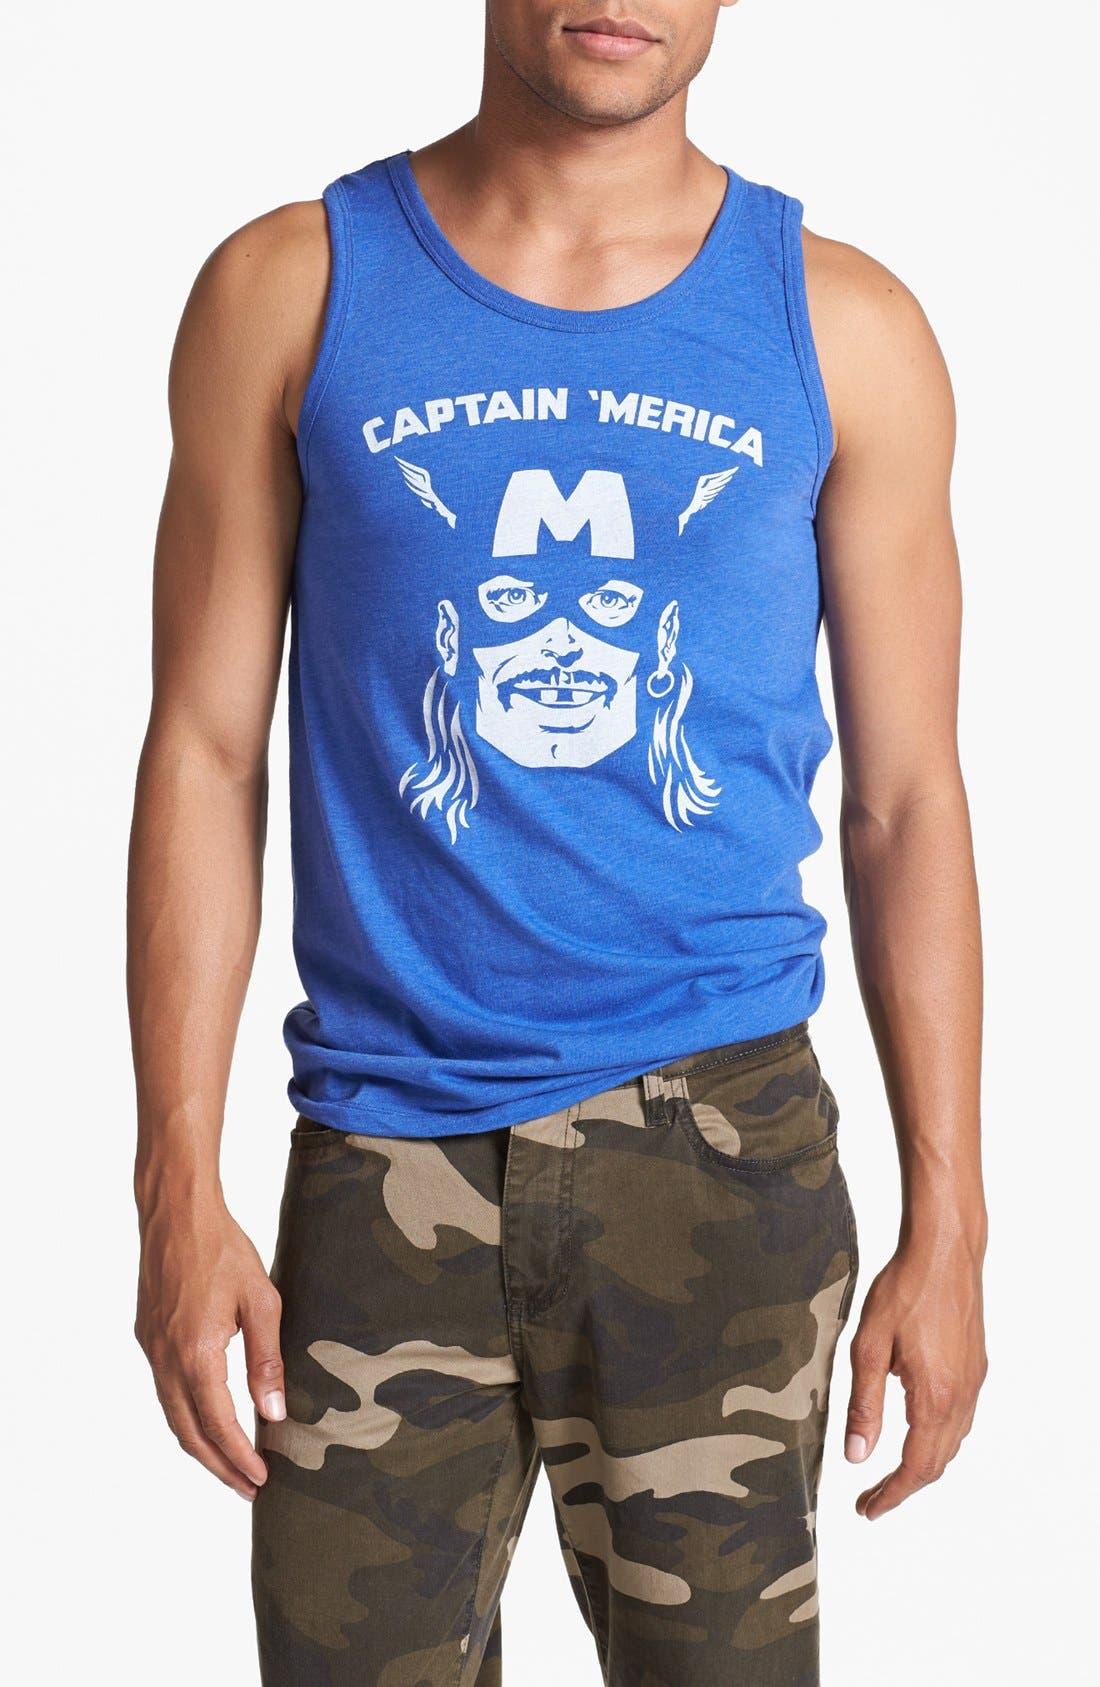 Alternate Image 1 Selected - Headline Shirt 'Captain Merica' Tank Top